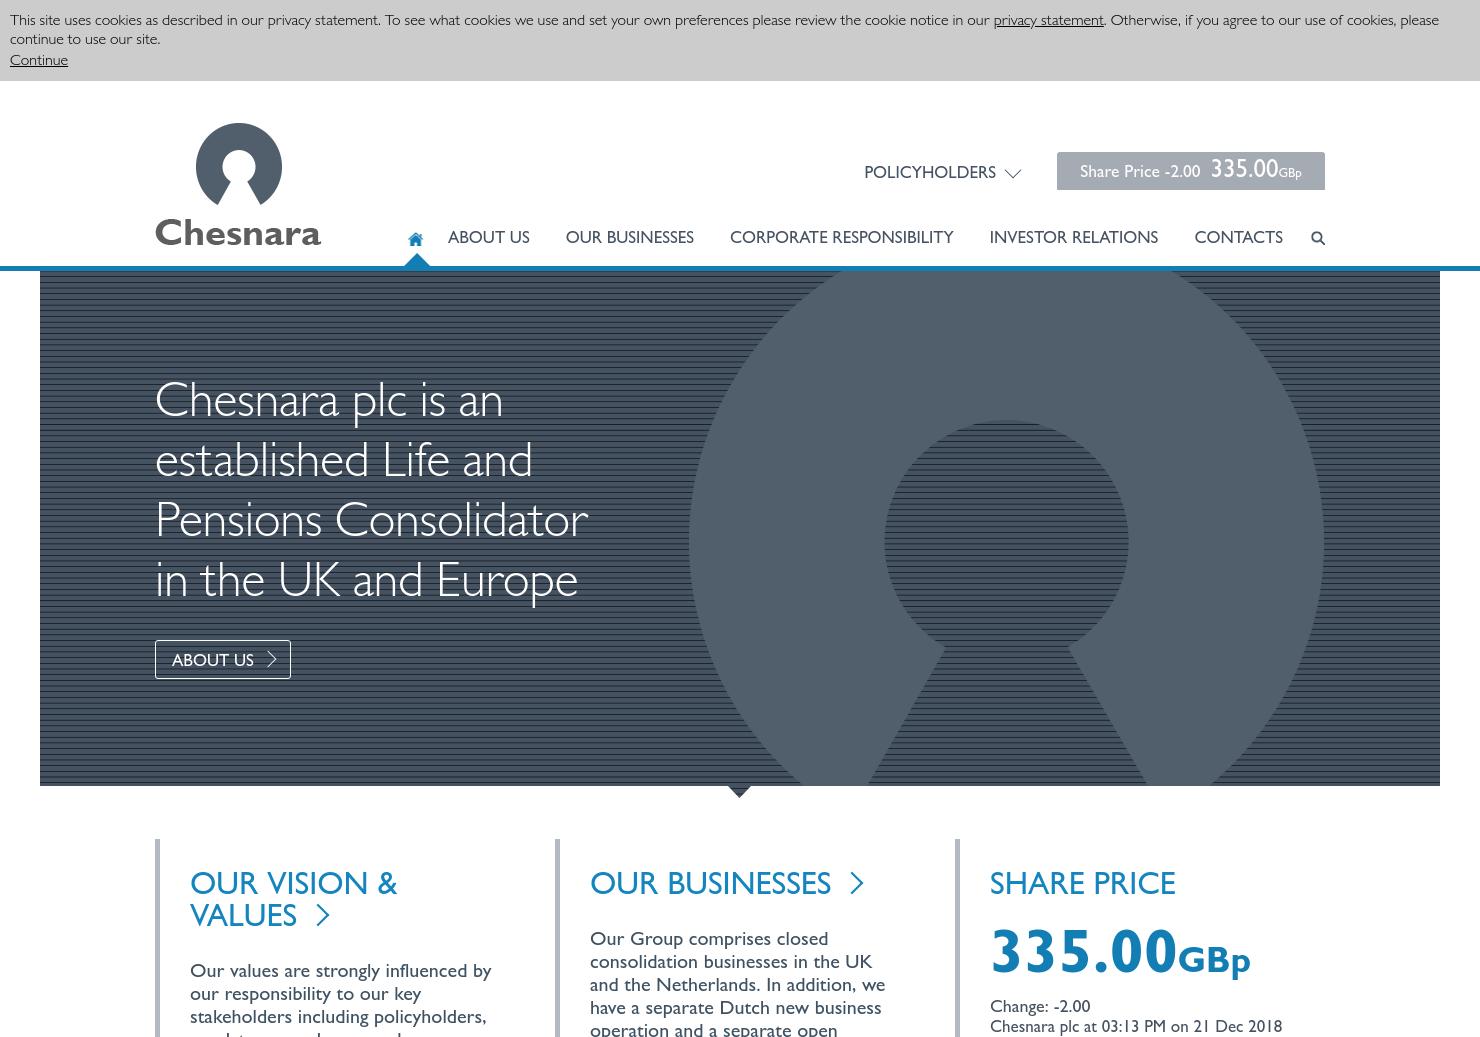 Chesnara Home Page